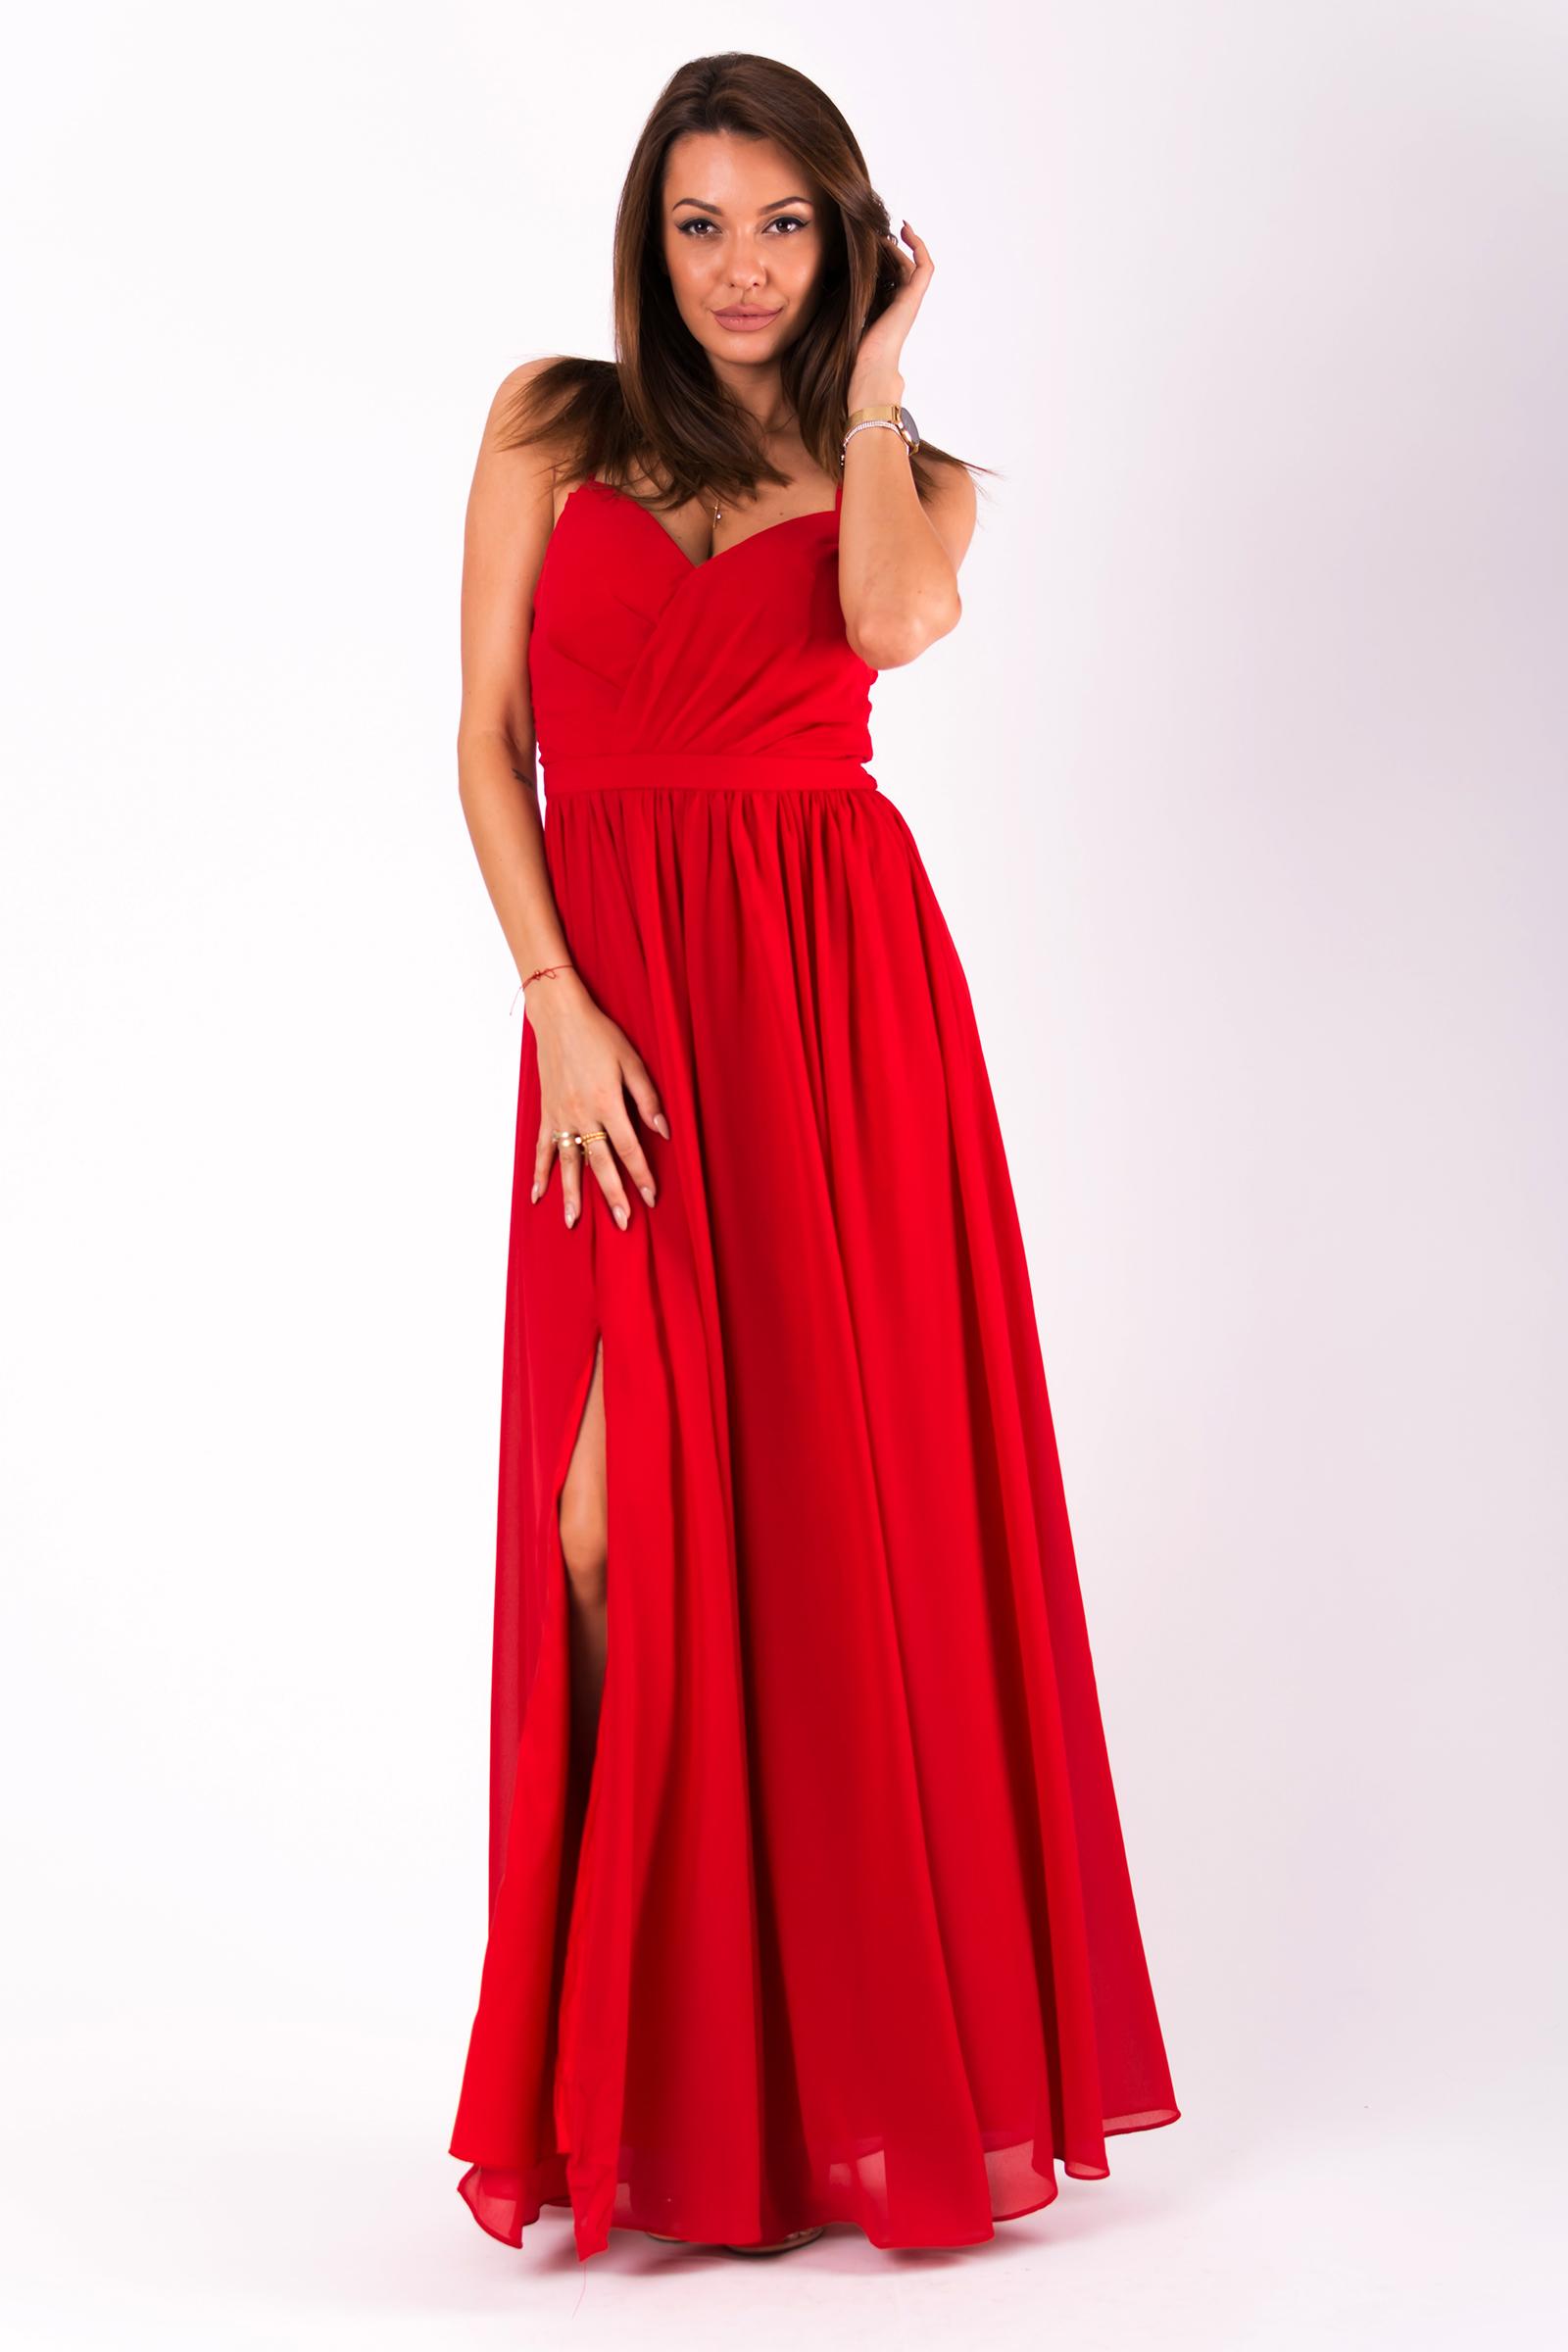 EVA & LOLA DRESS RED 51008-1